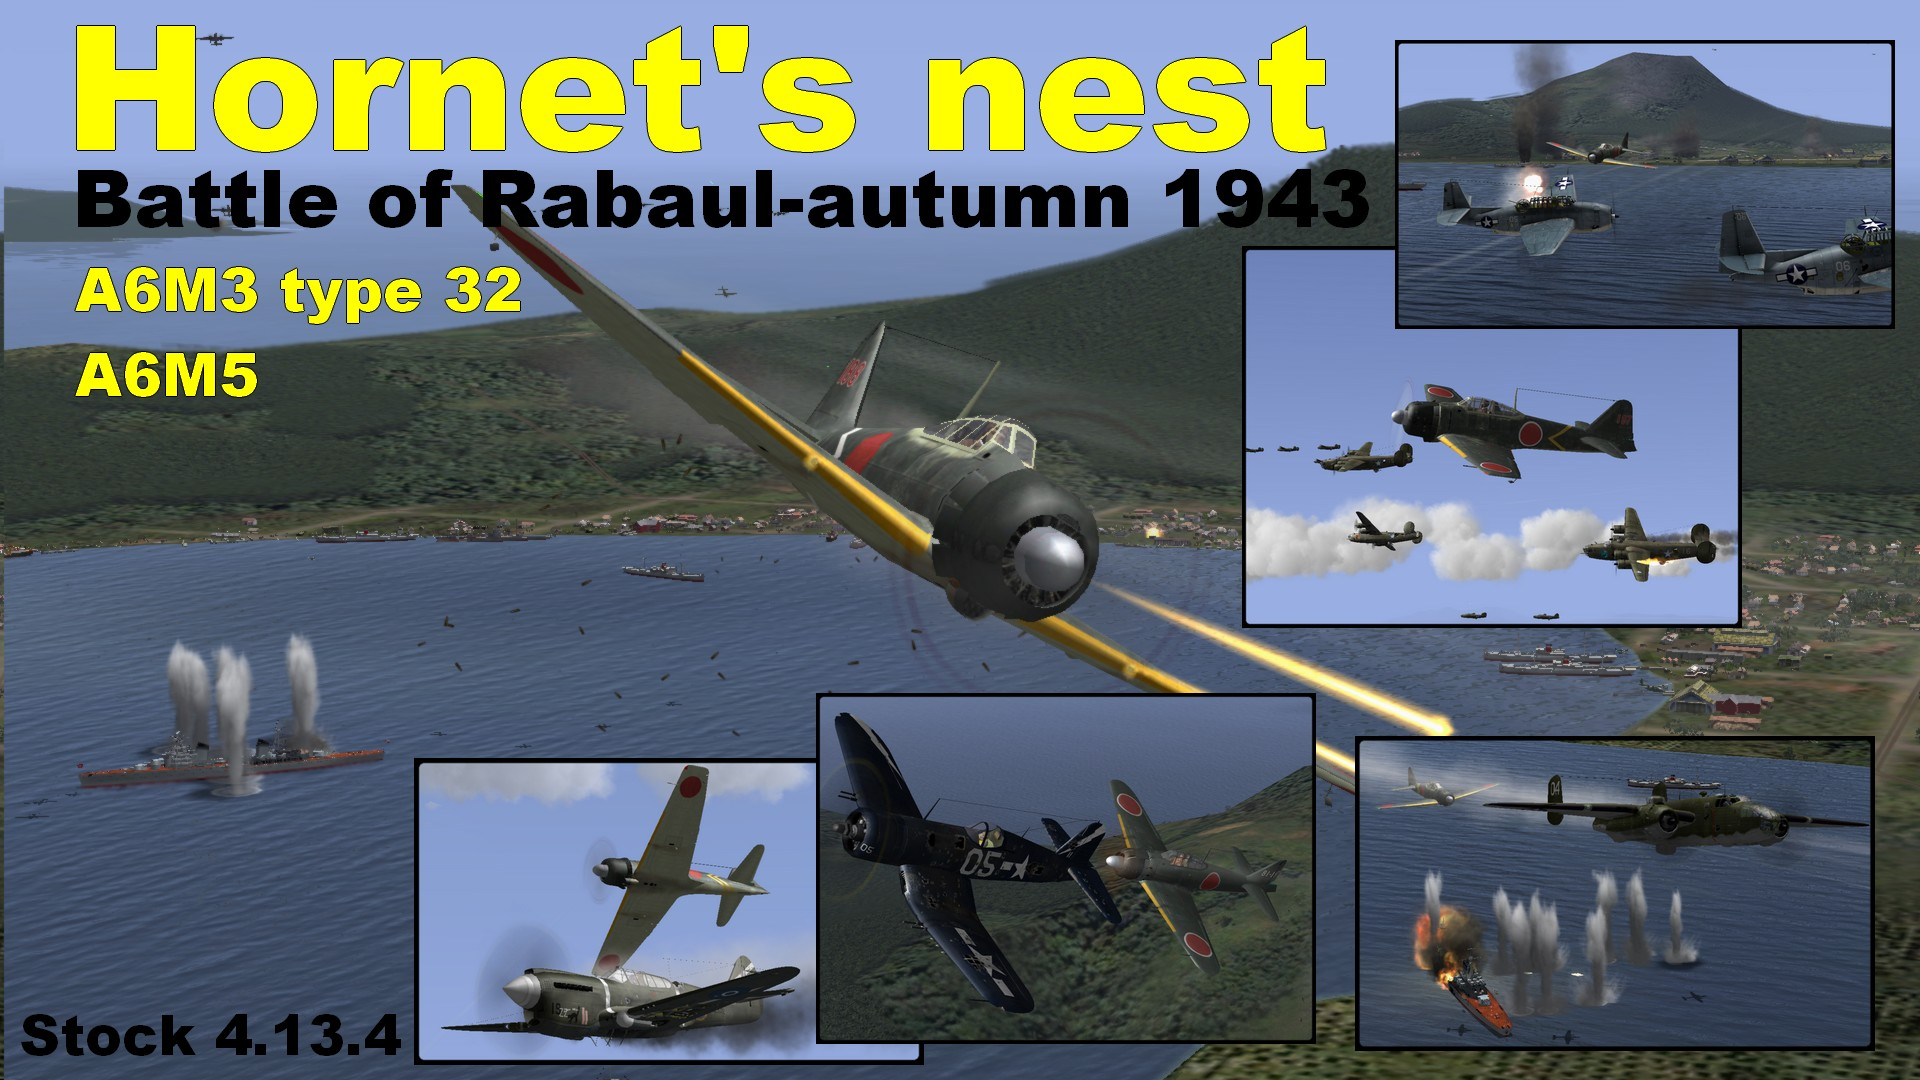 www.sturmovik1946.estranky.cz/img/original/2330/hornet-nest-cover.jpg